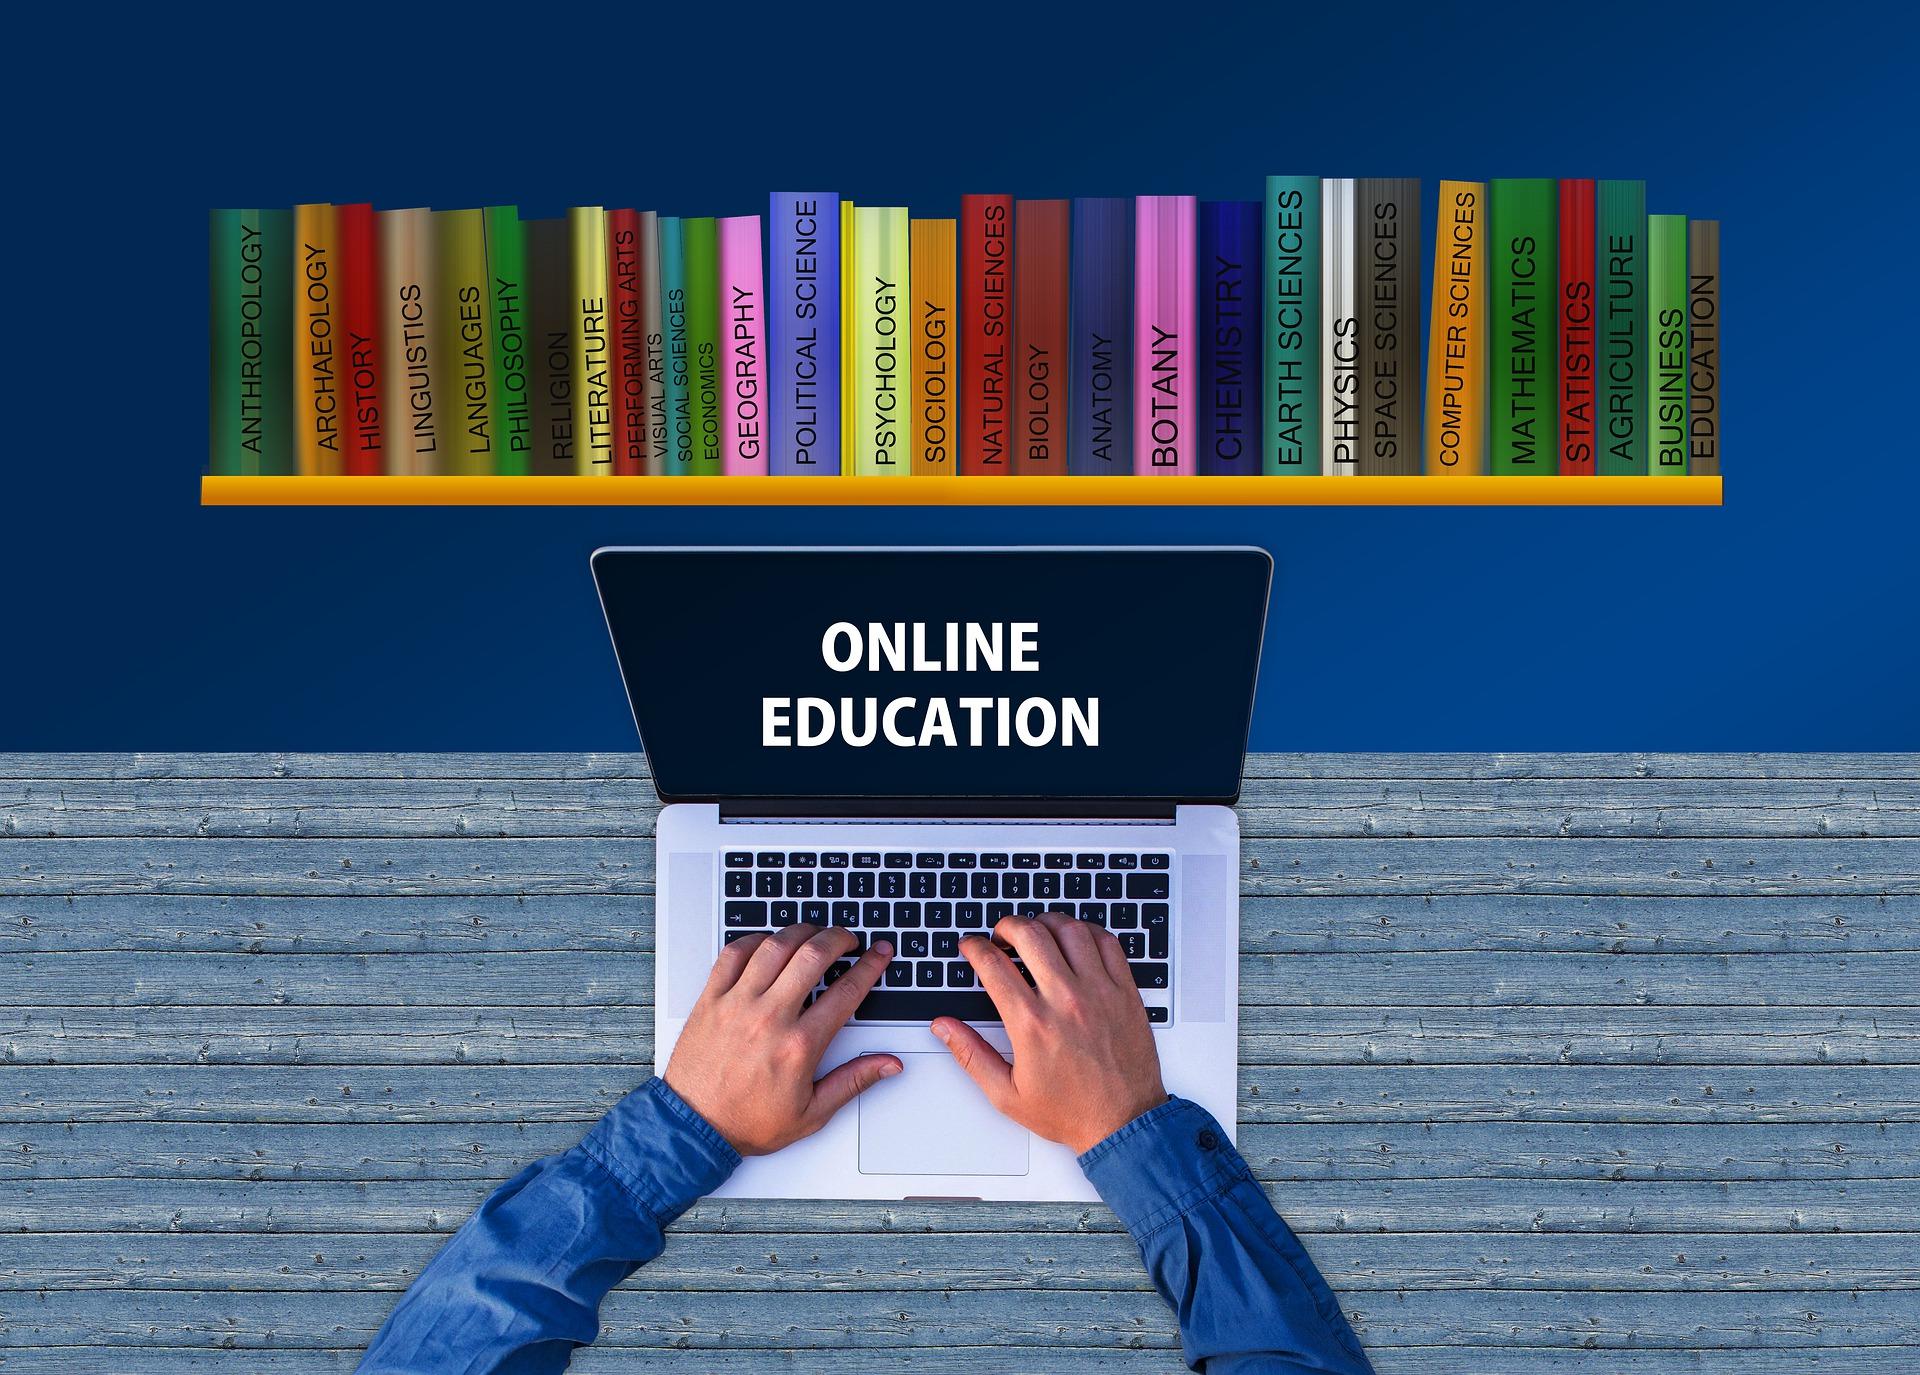 Școala online – suntem prizonierii unor stereotipuri?